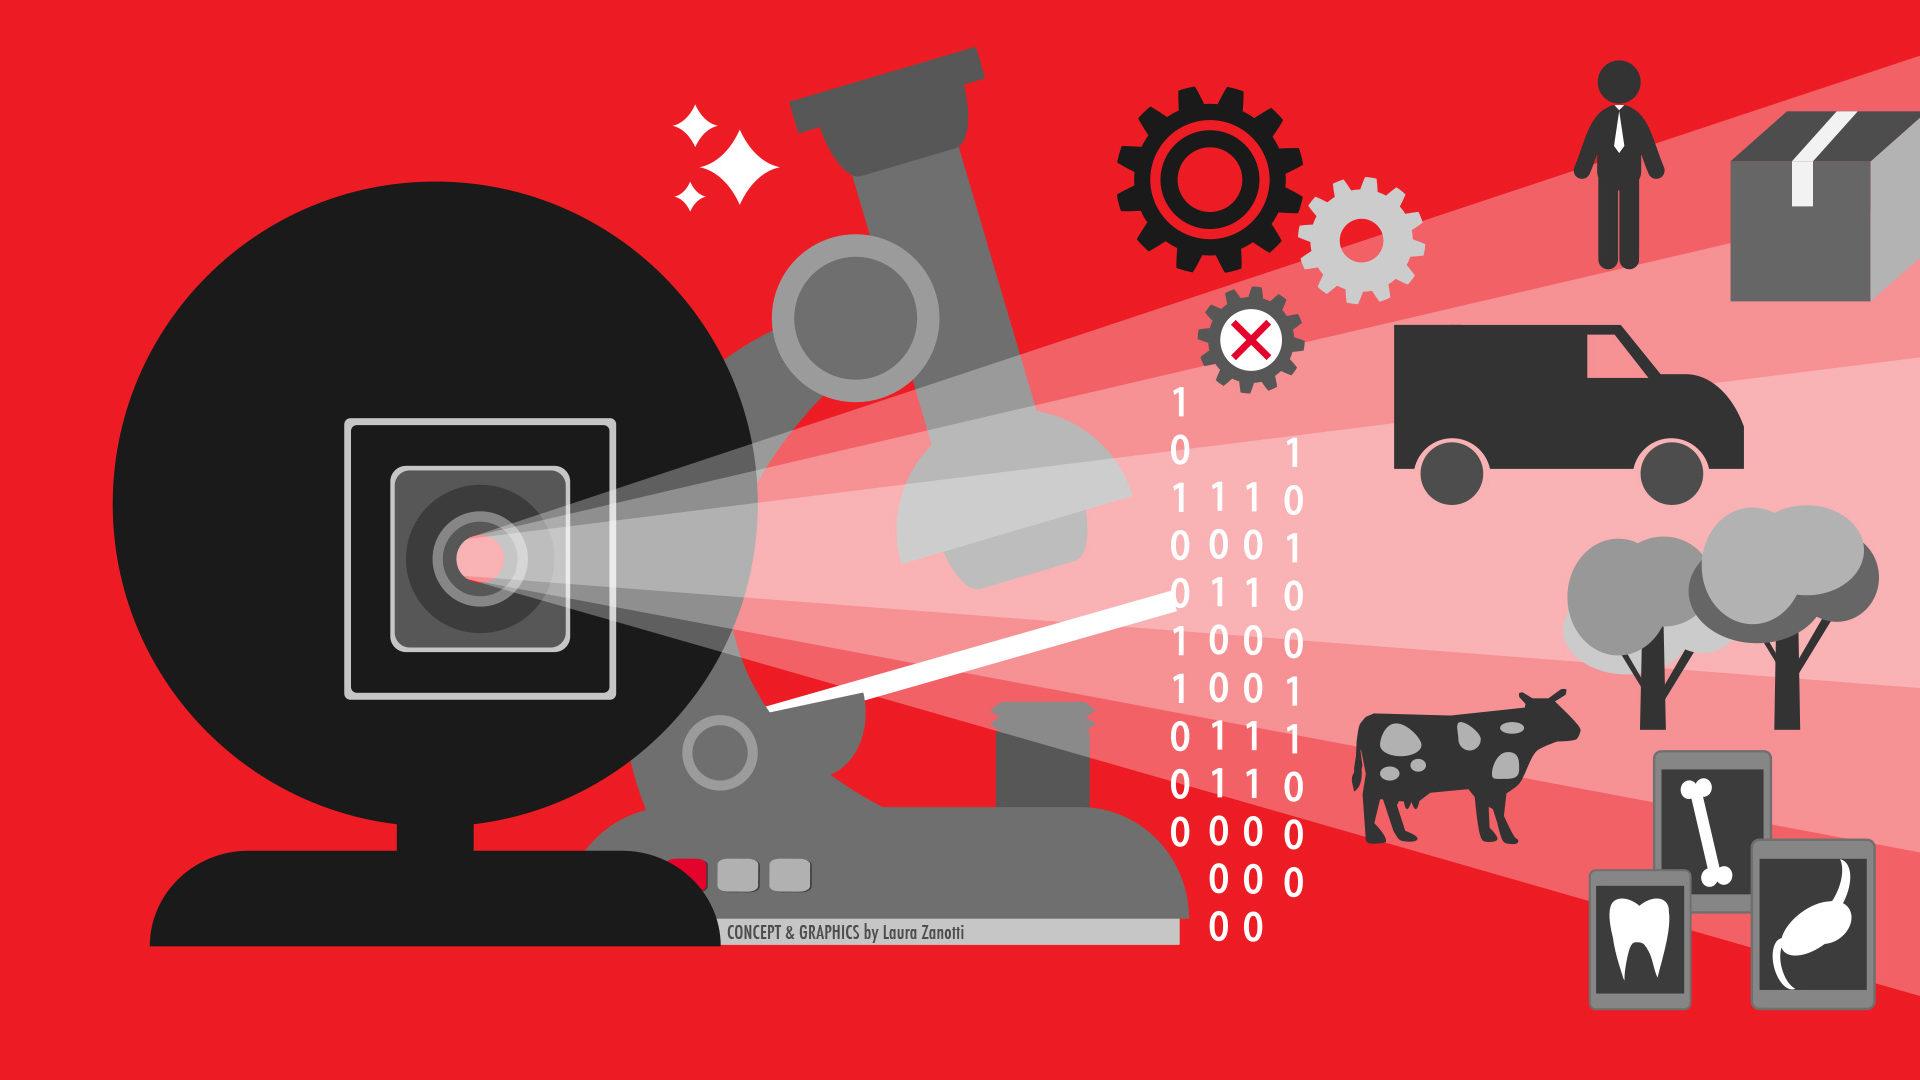 reti neurali e deep learning 1